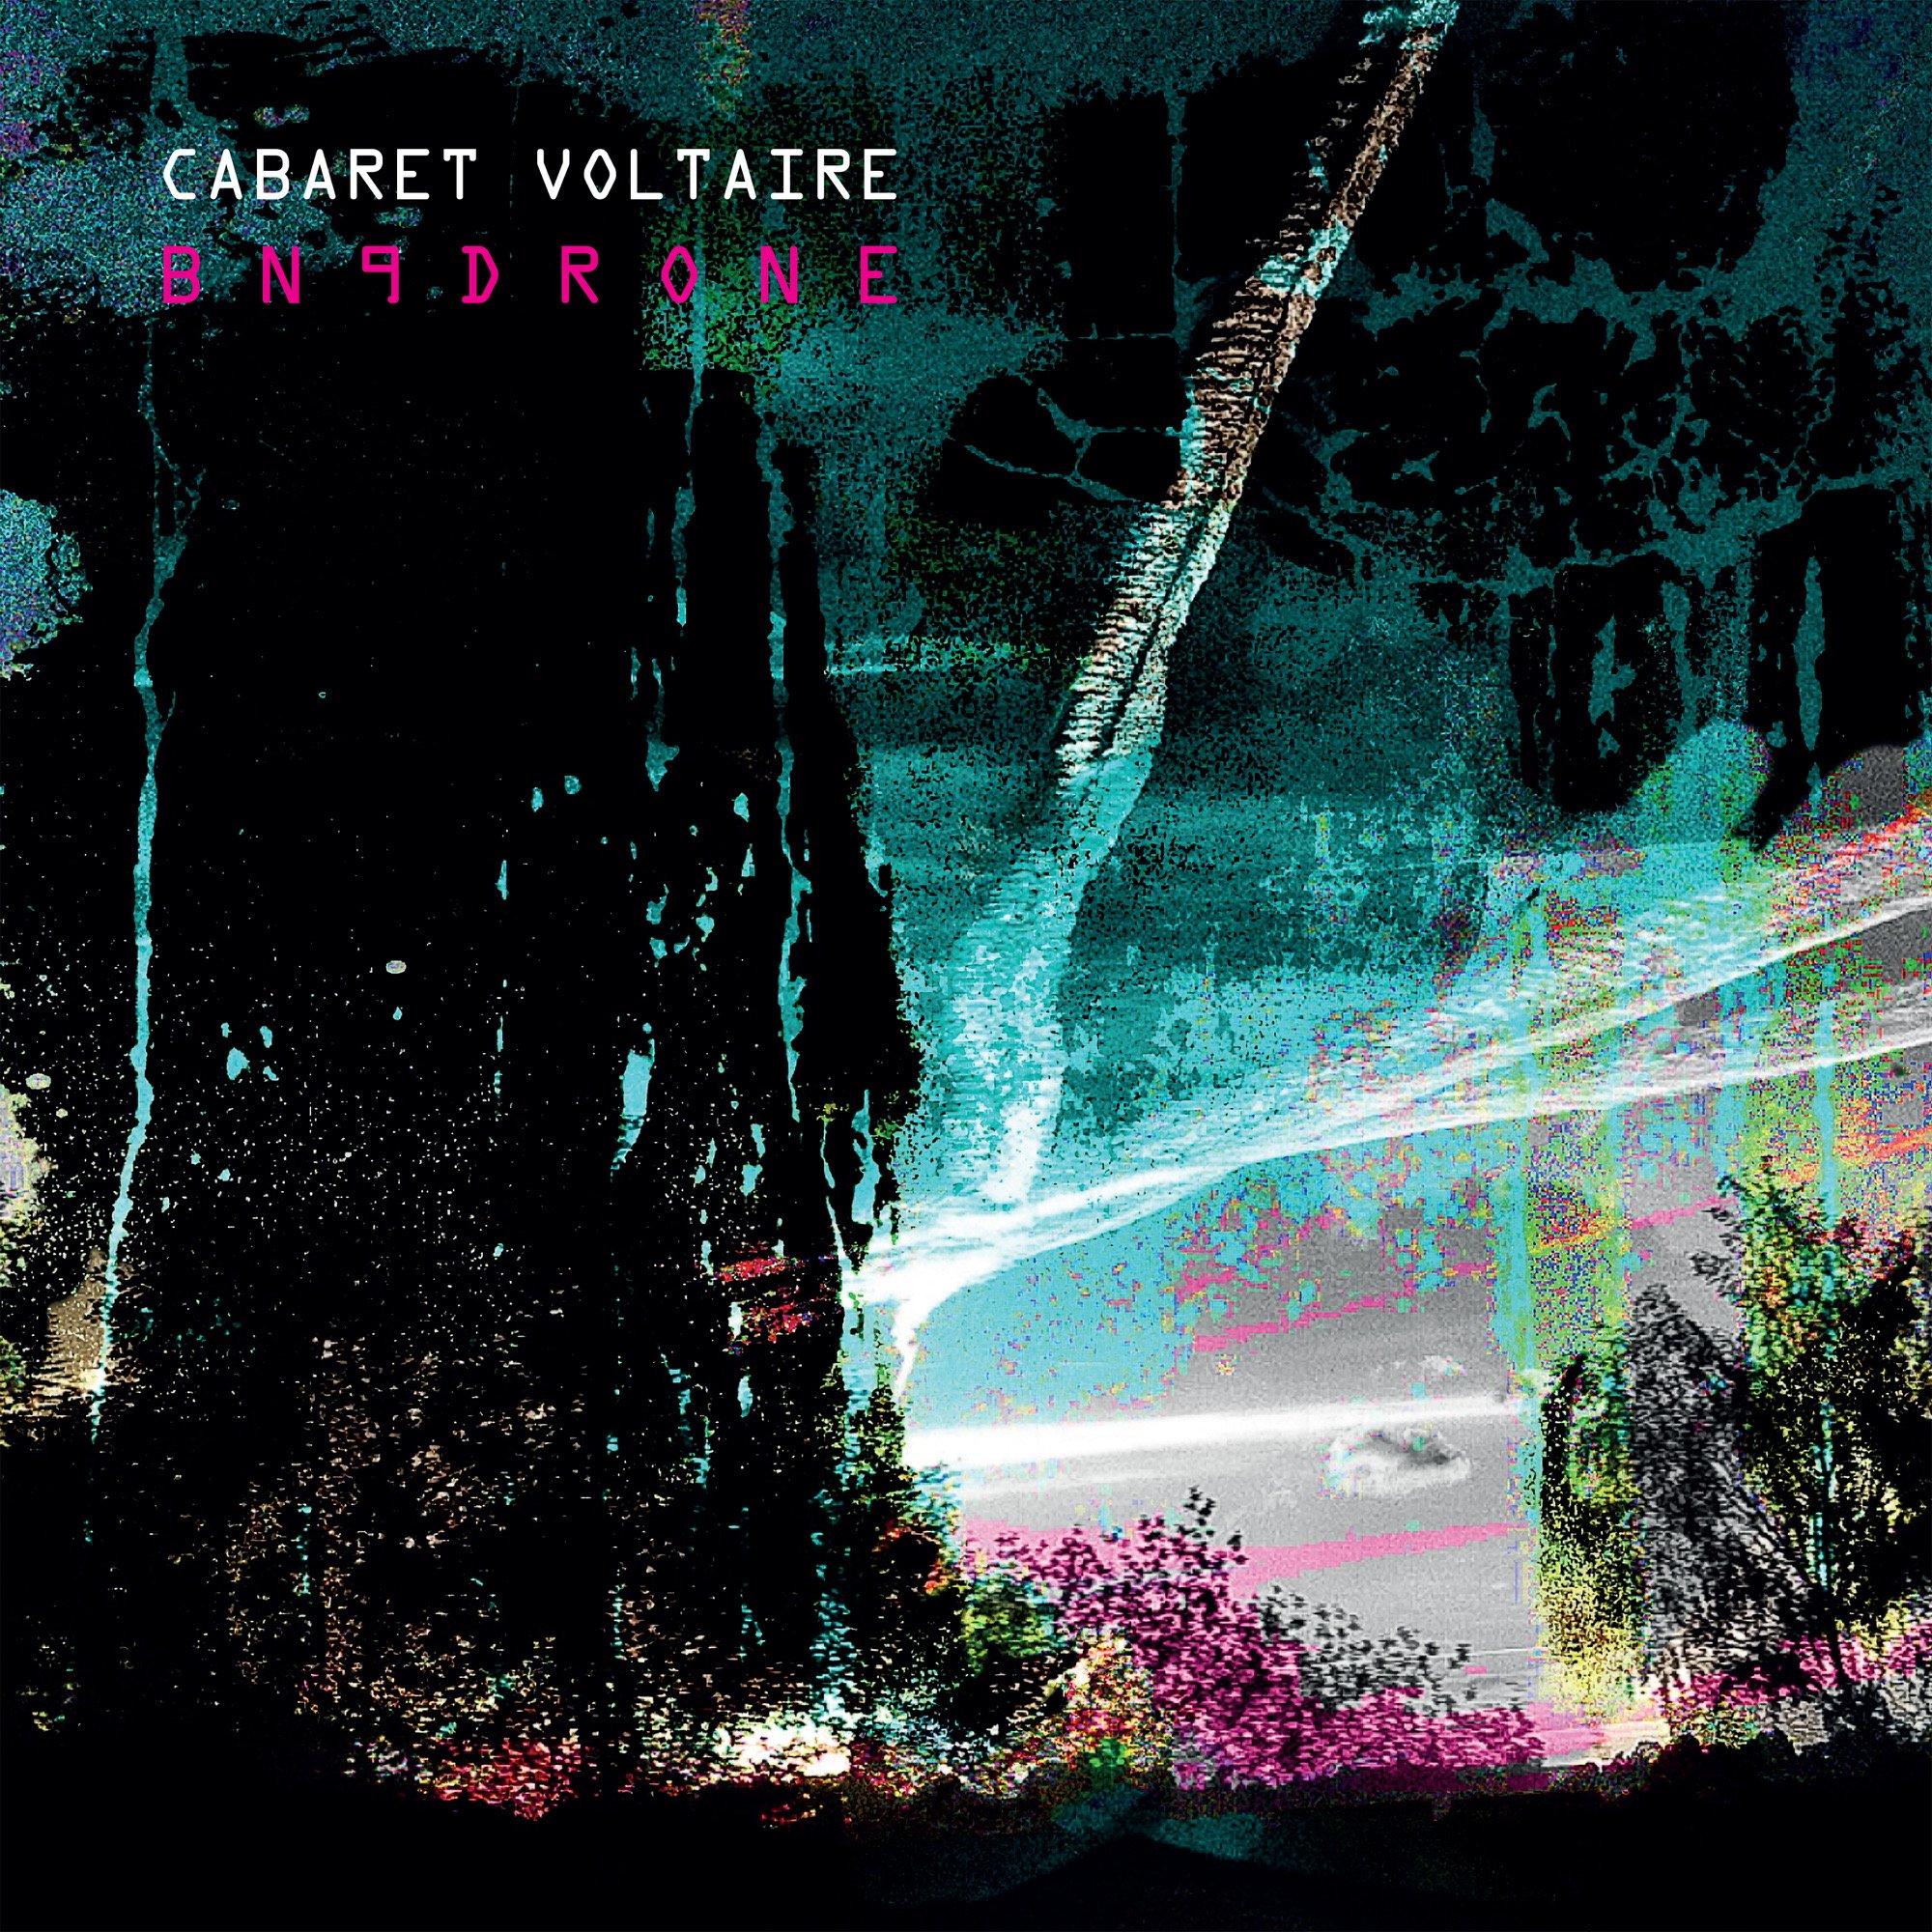 BN9Drone - Cabaret Voltaire - Musik - MUTE - 5400863041199 - April 23, 2021